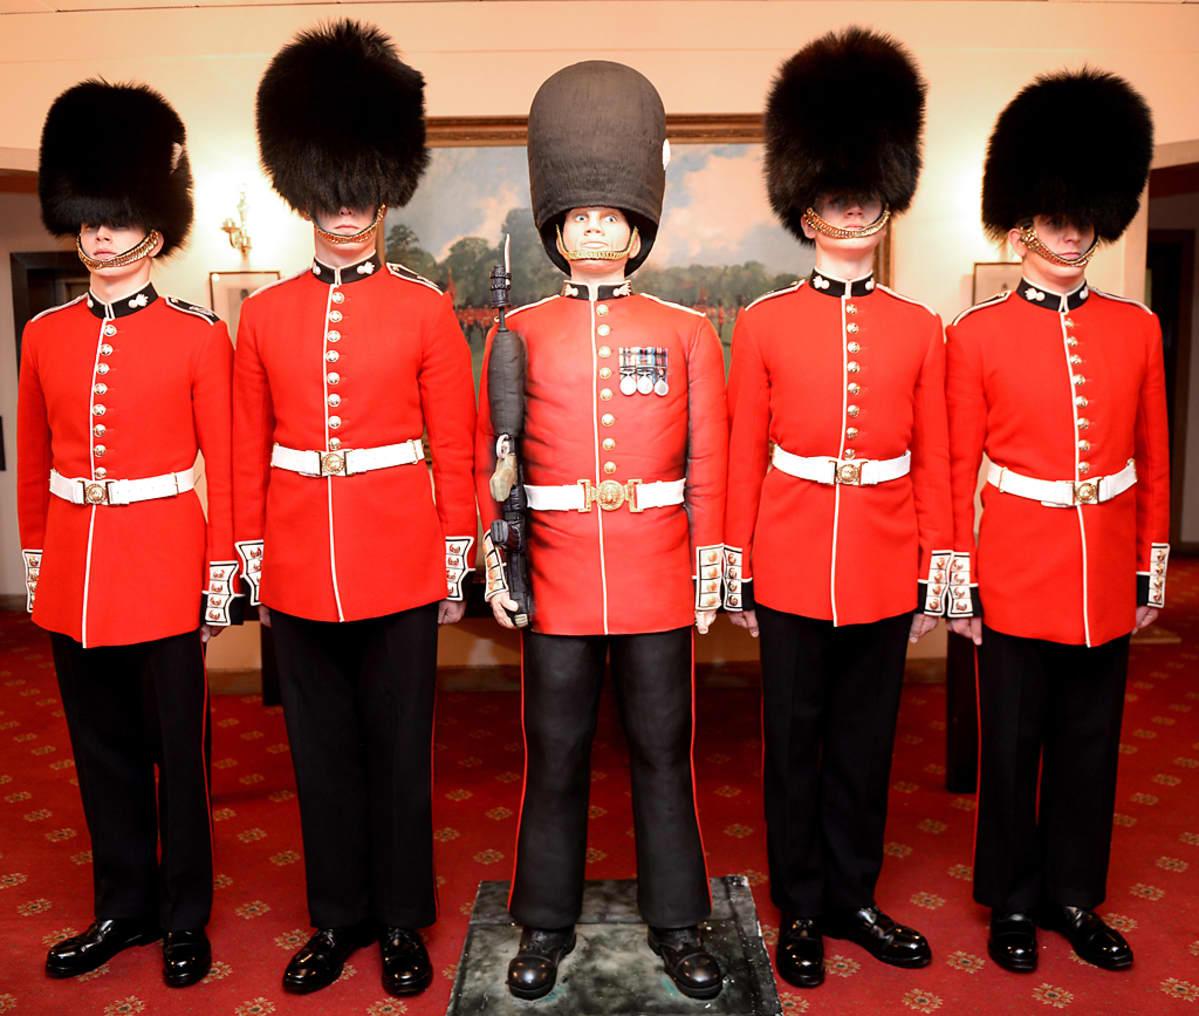 Krenatöörikaartin vartiosotilas Johan Brunt, vartiosotilas George Parker, Vartiosotilas Gus -kakku, vartiosotilas Harry Aspishaw, sekä vartiosotilas James Brookes.